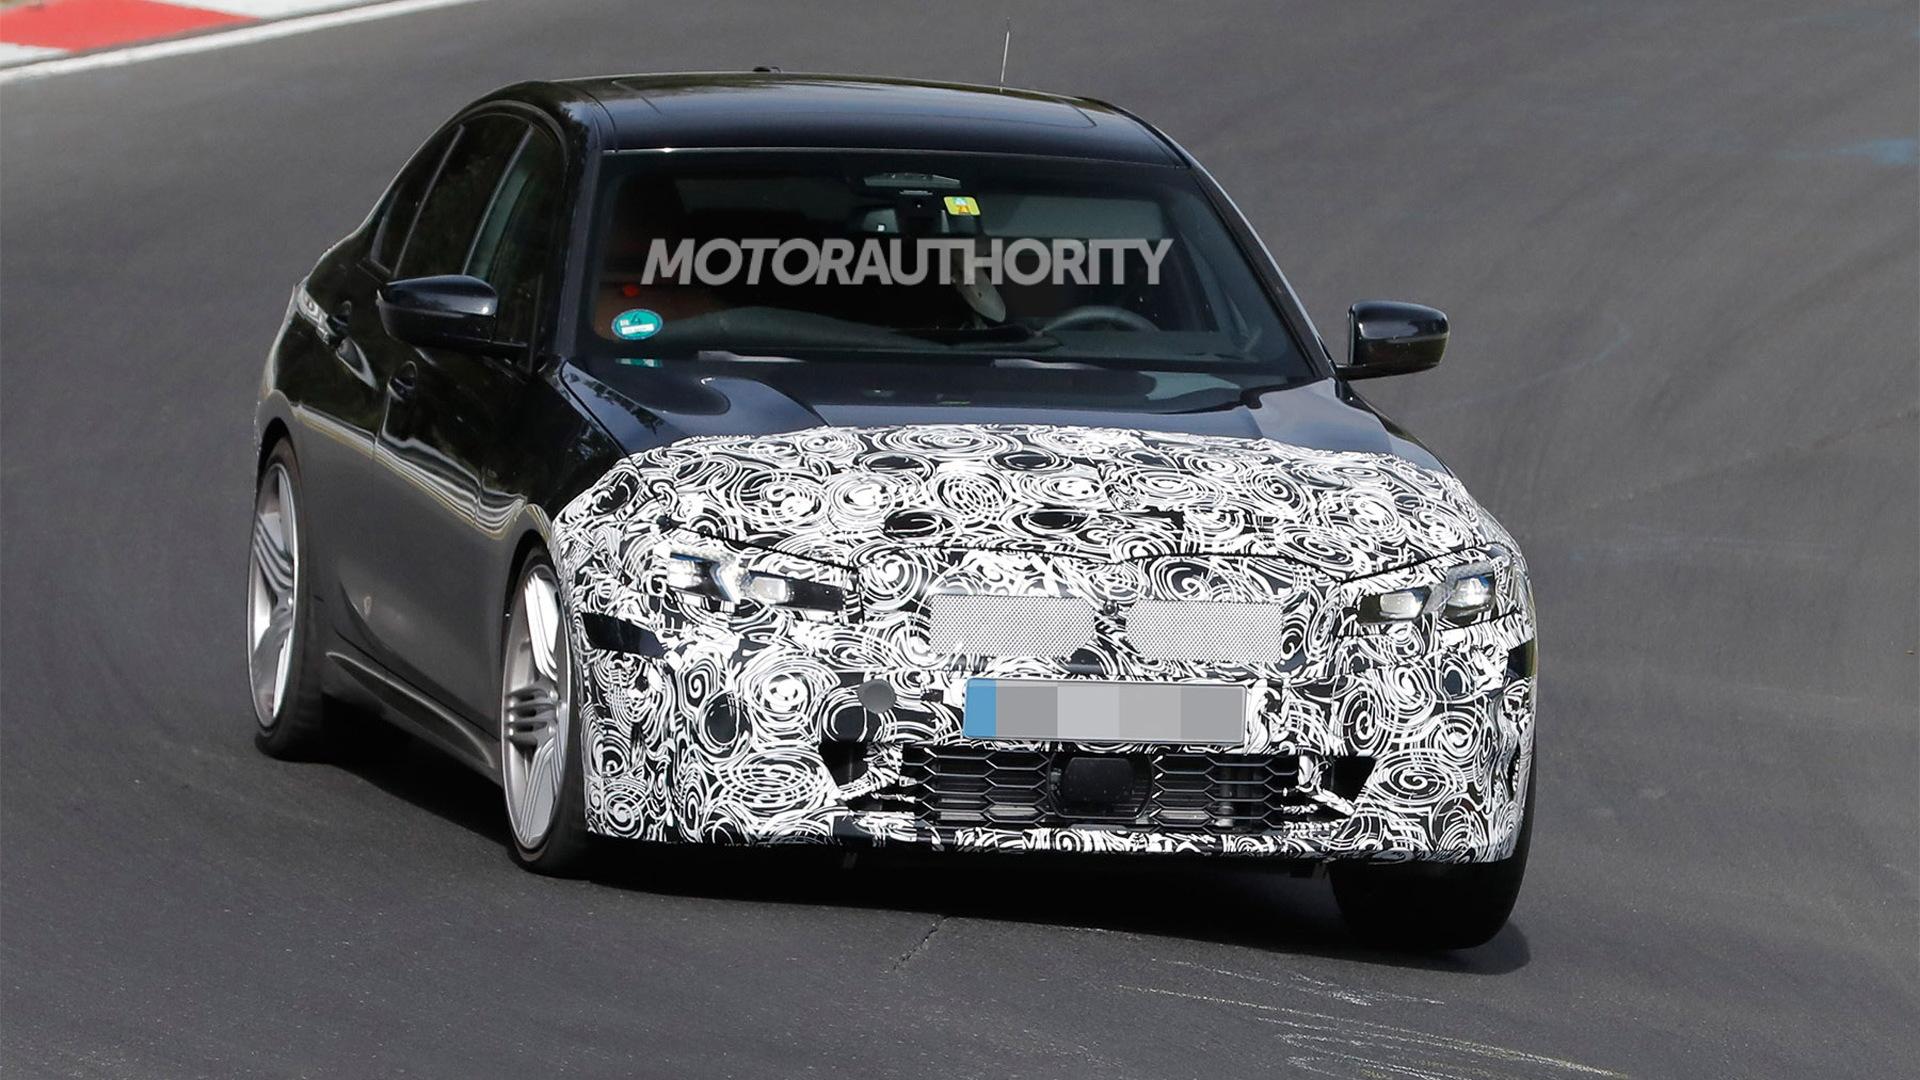 2023 BMW Alpina B3 facelift spy shots - Photo credit:S. Baldauf/SB-Medien